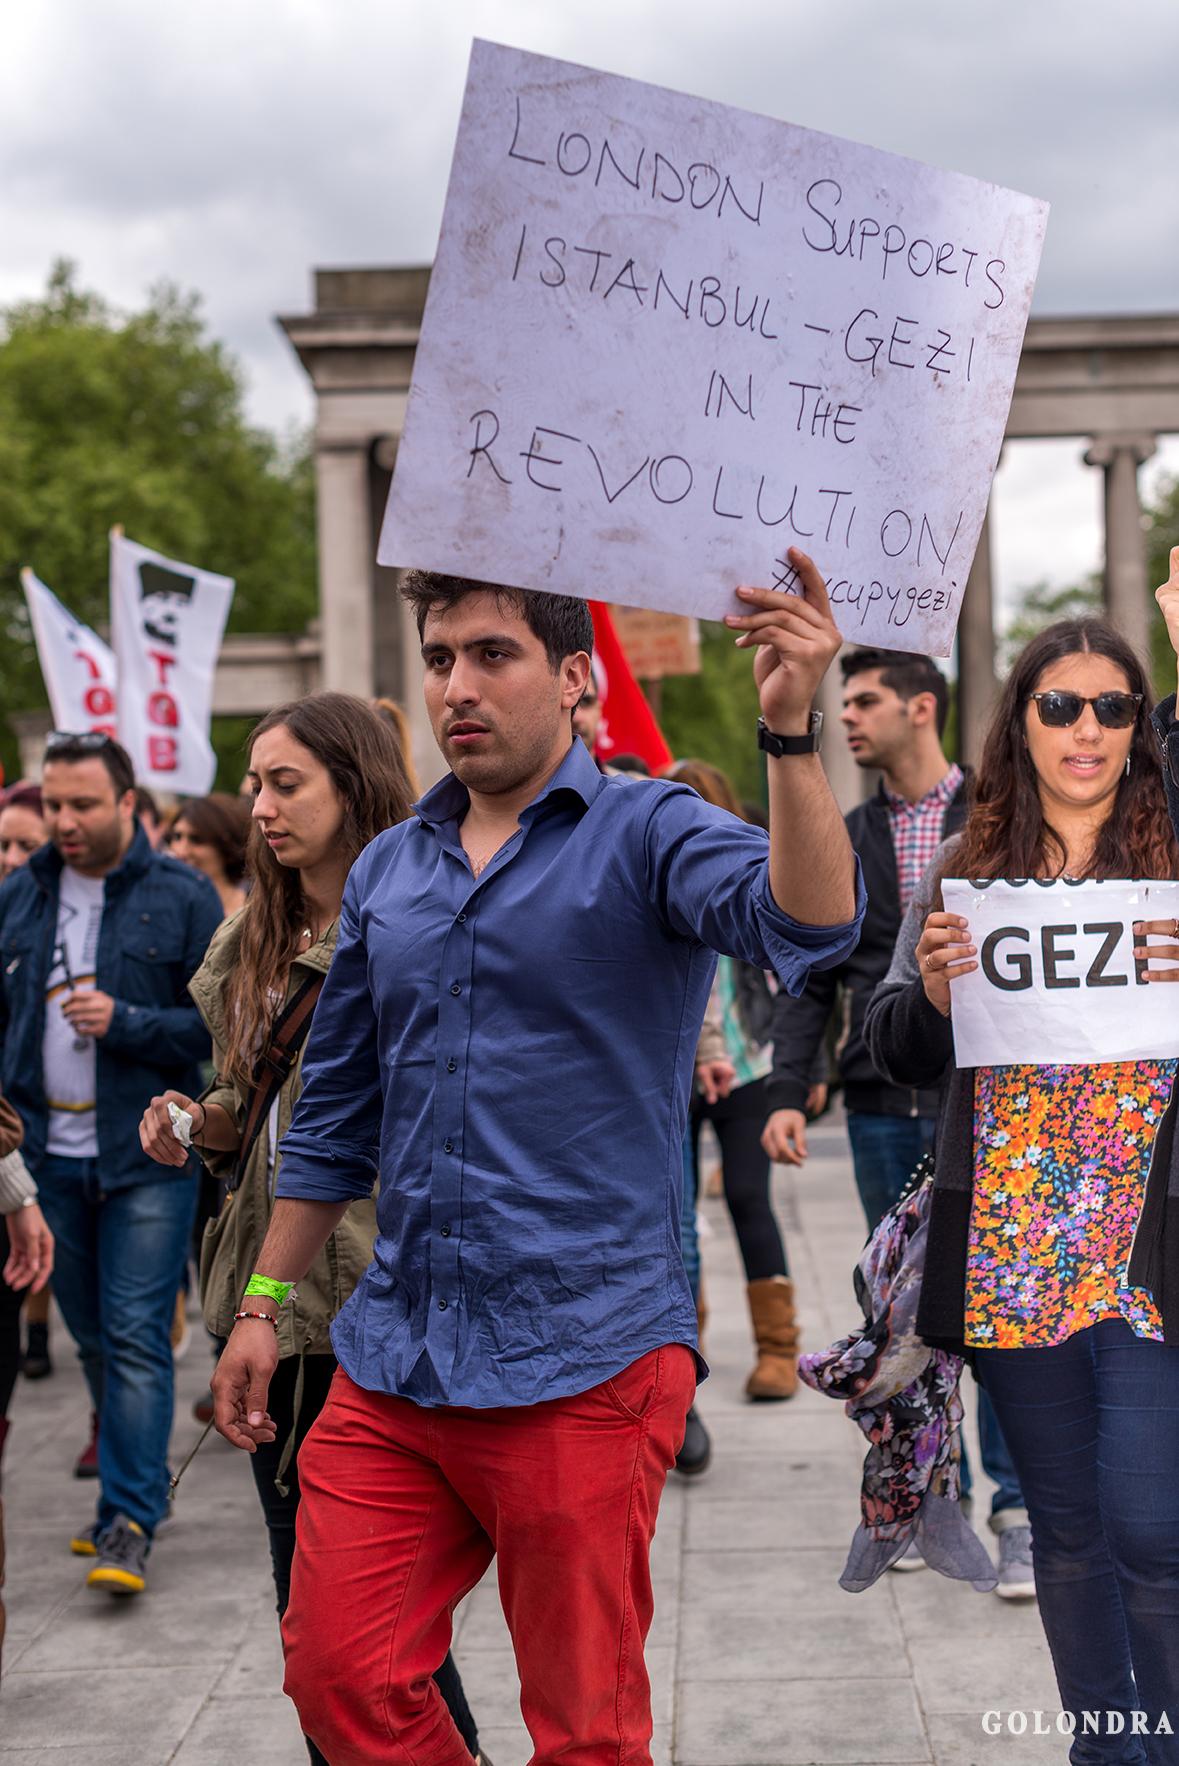 Protesting Turkish Government - Turk Hukumetini Protesto - Londra - London (36)